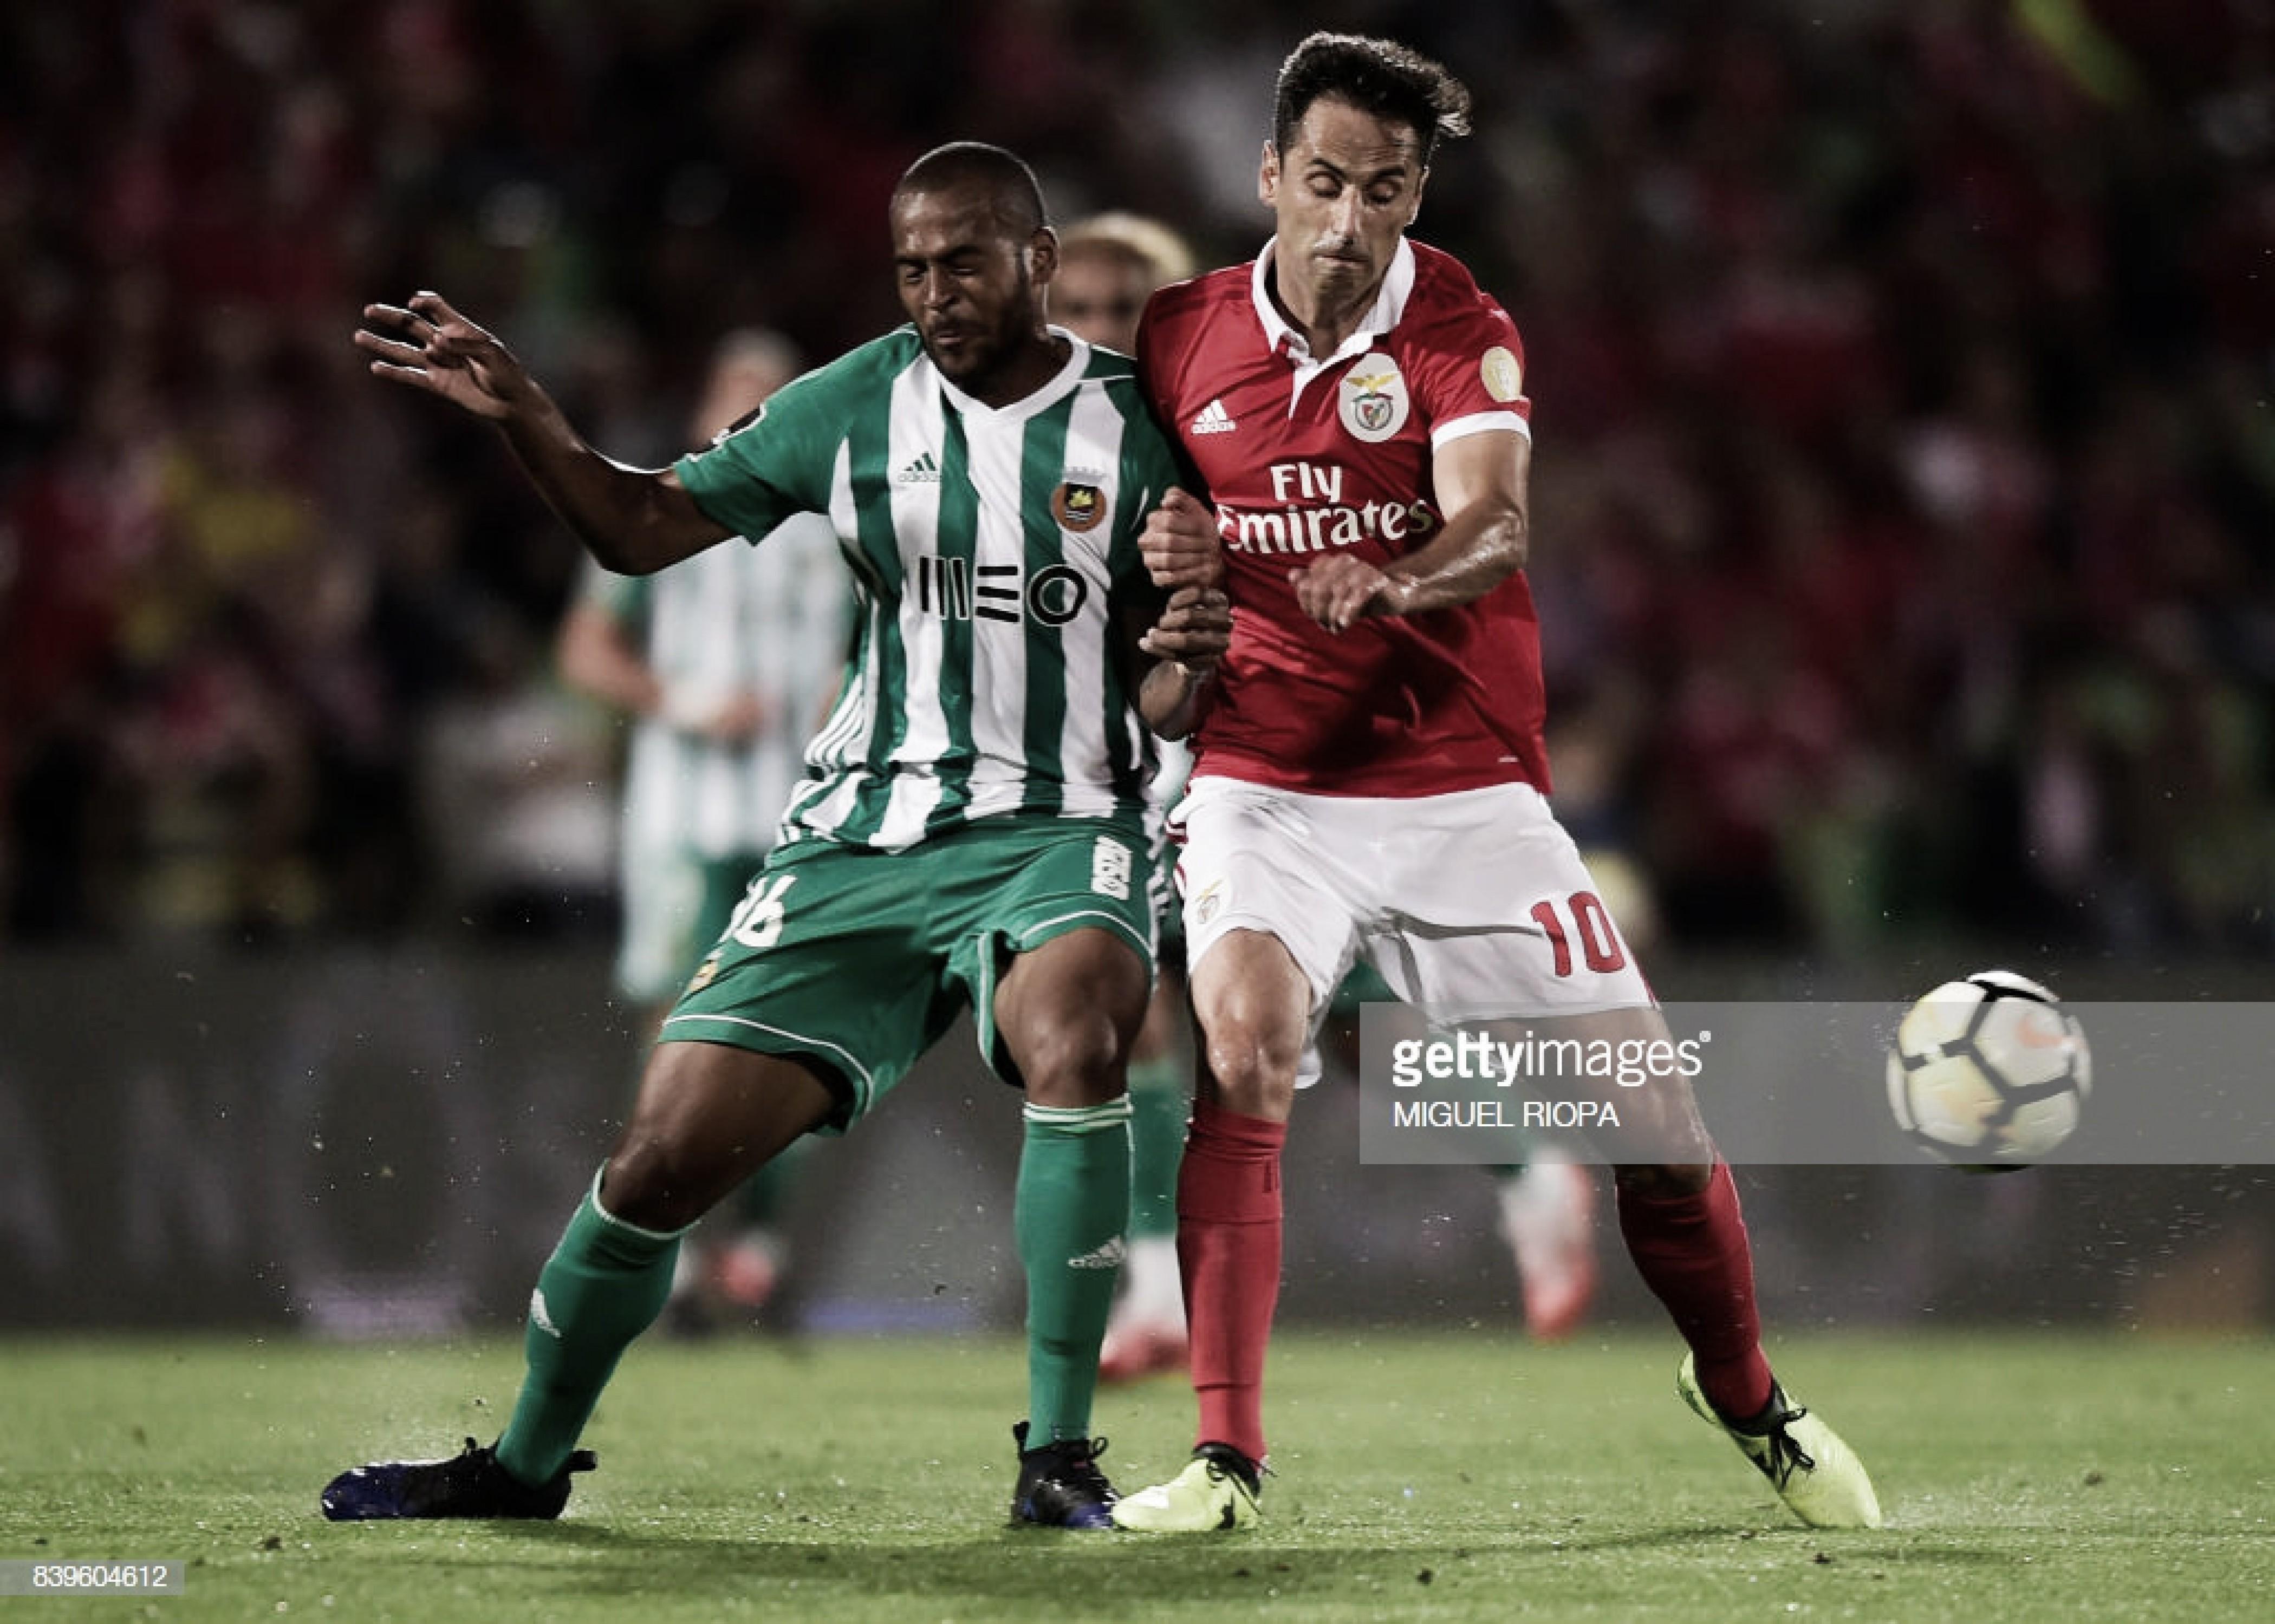 Taça da Liga: Benfica X Rio Ave